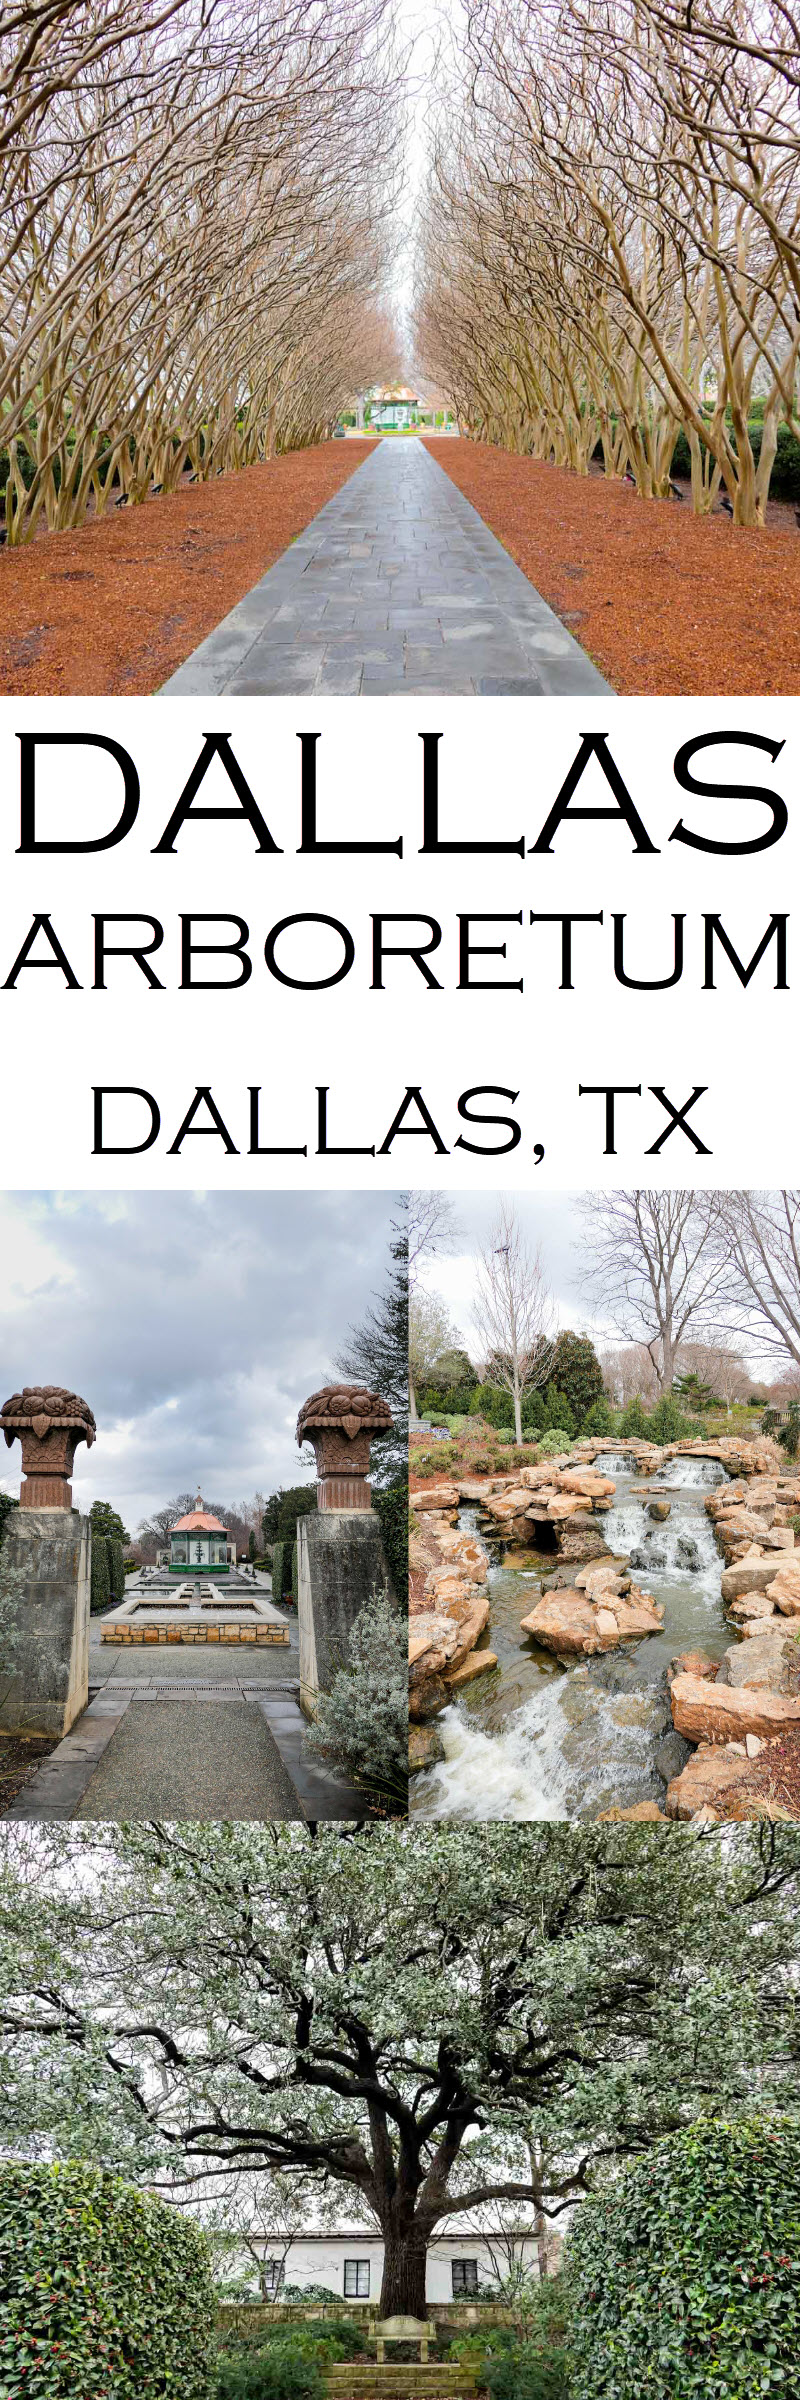 Dallas Arboretum + Botanical Gardens Photos + Review #lpworldtravels #texas #dallas #arboretums #botanicalgarden #travel #travelblog #travelblogger #travelwriter #travelguide